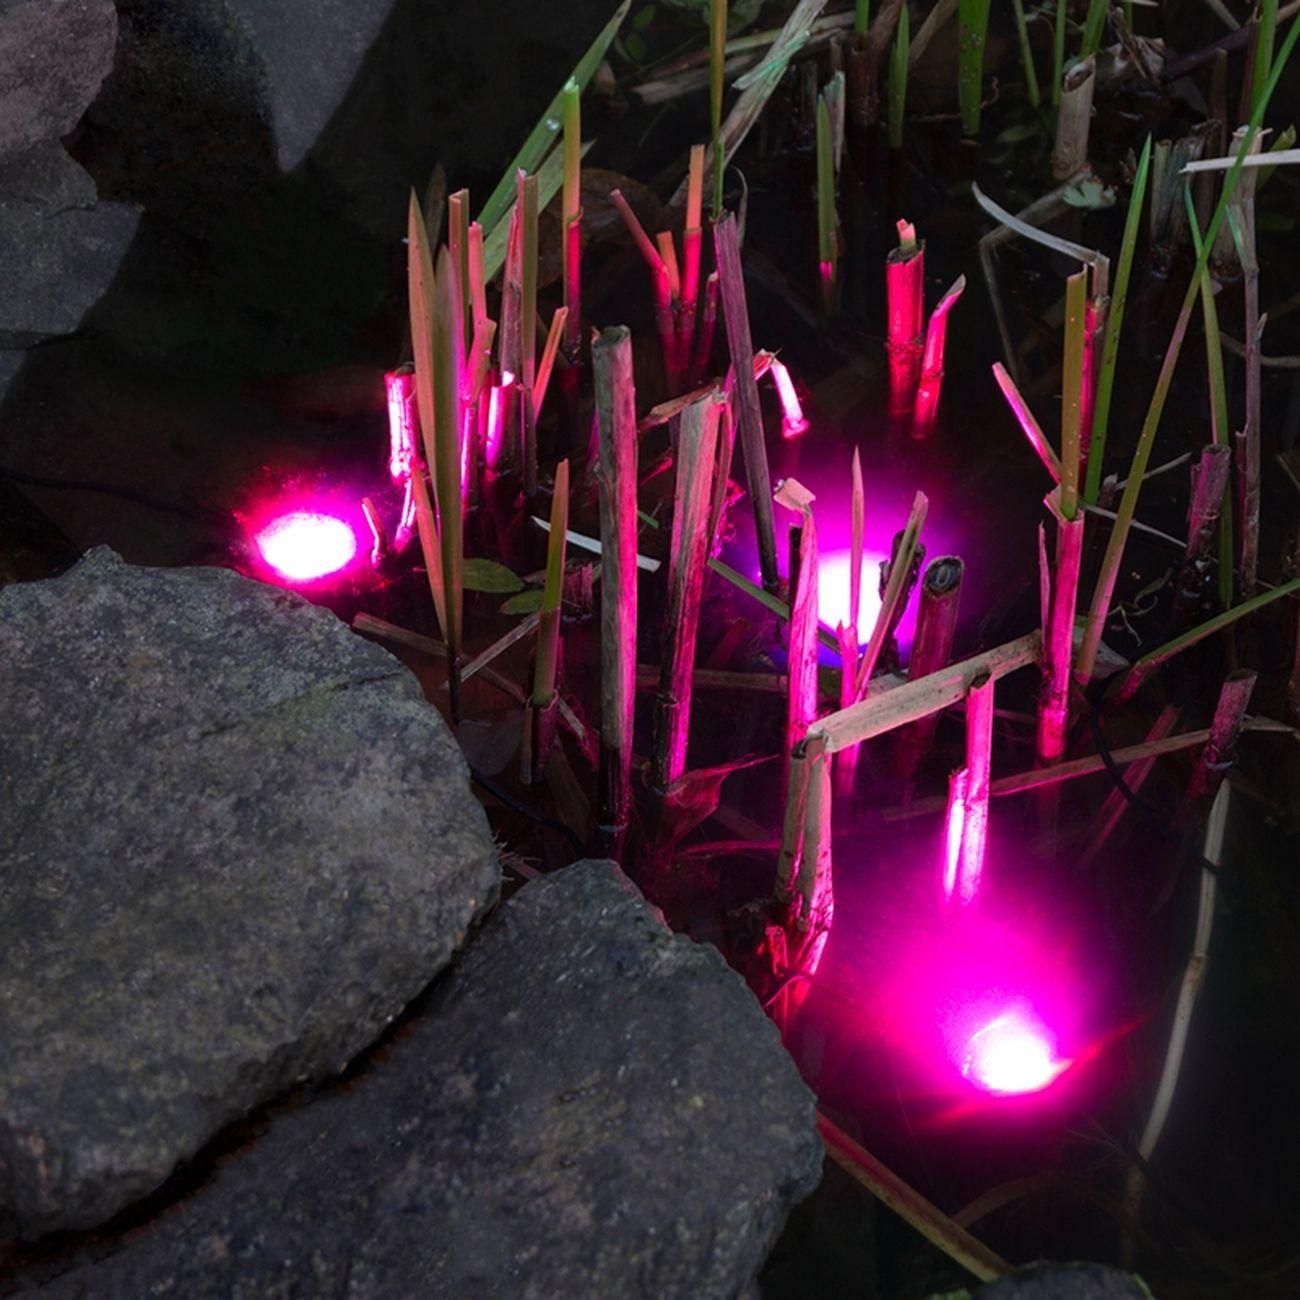 solar led strahler led lampe wasserdicht teichbeleuchtung teich lampen garten ebay. Black Bedroom Furniture Sets. Home Design Ideas